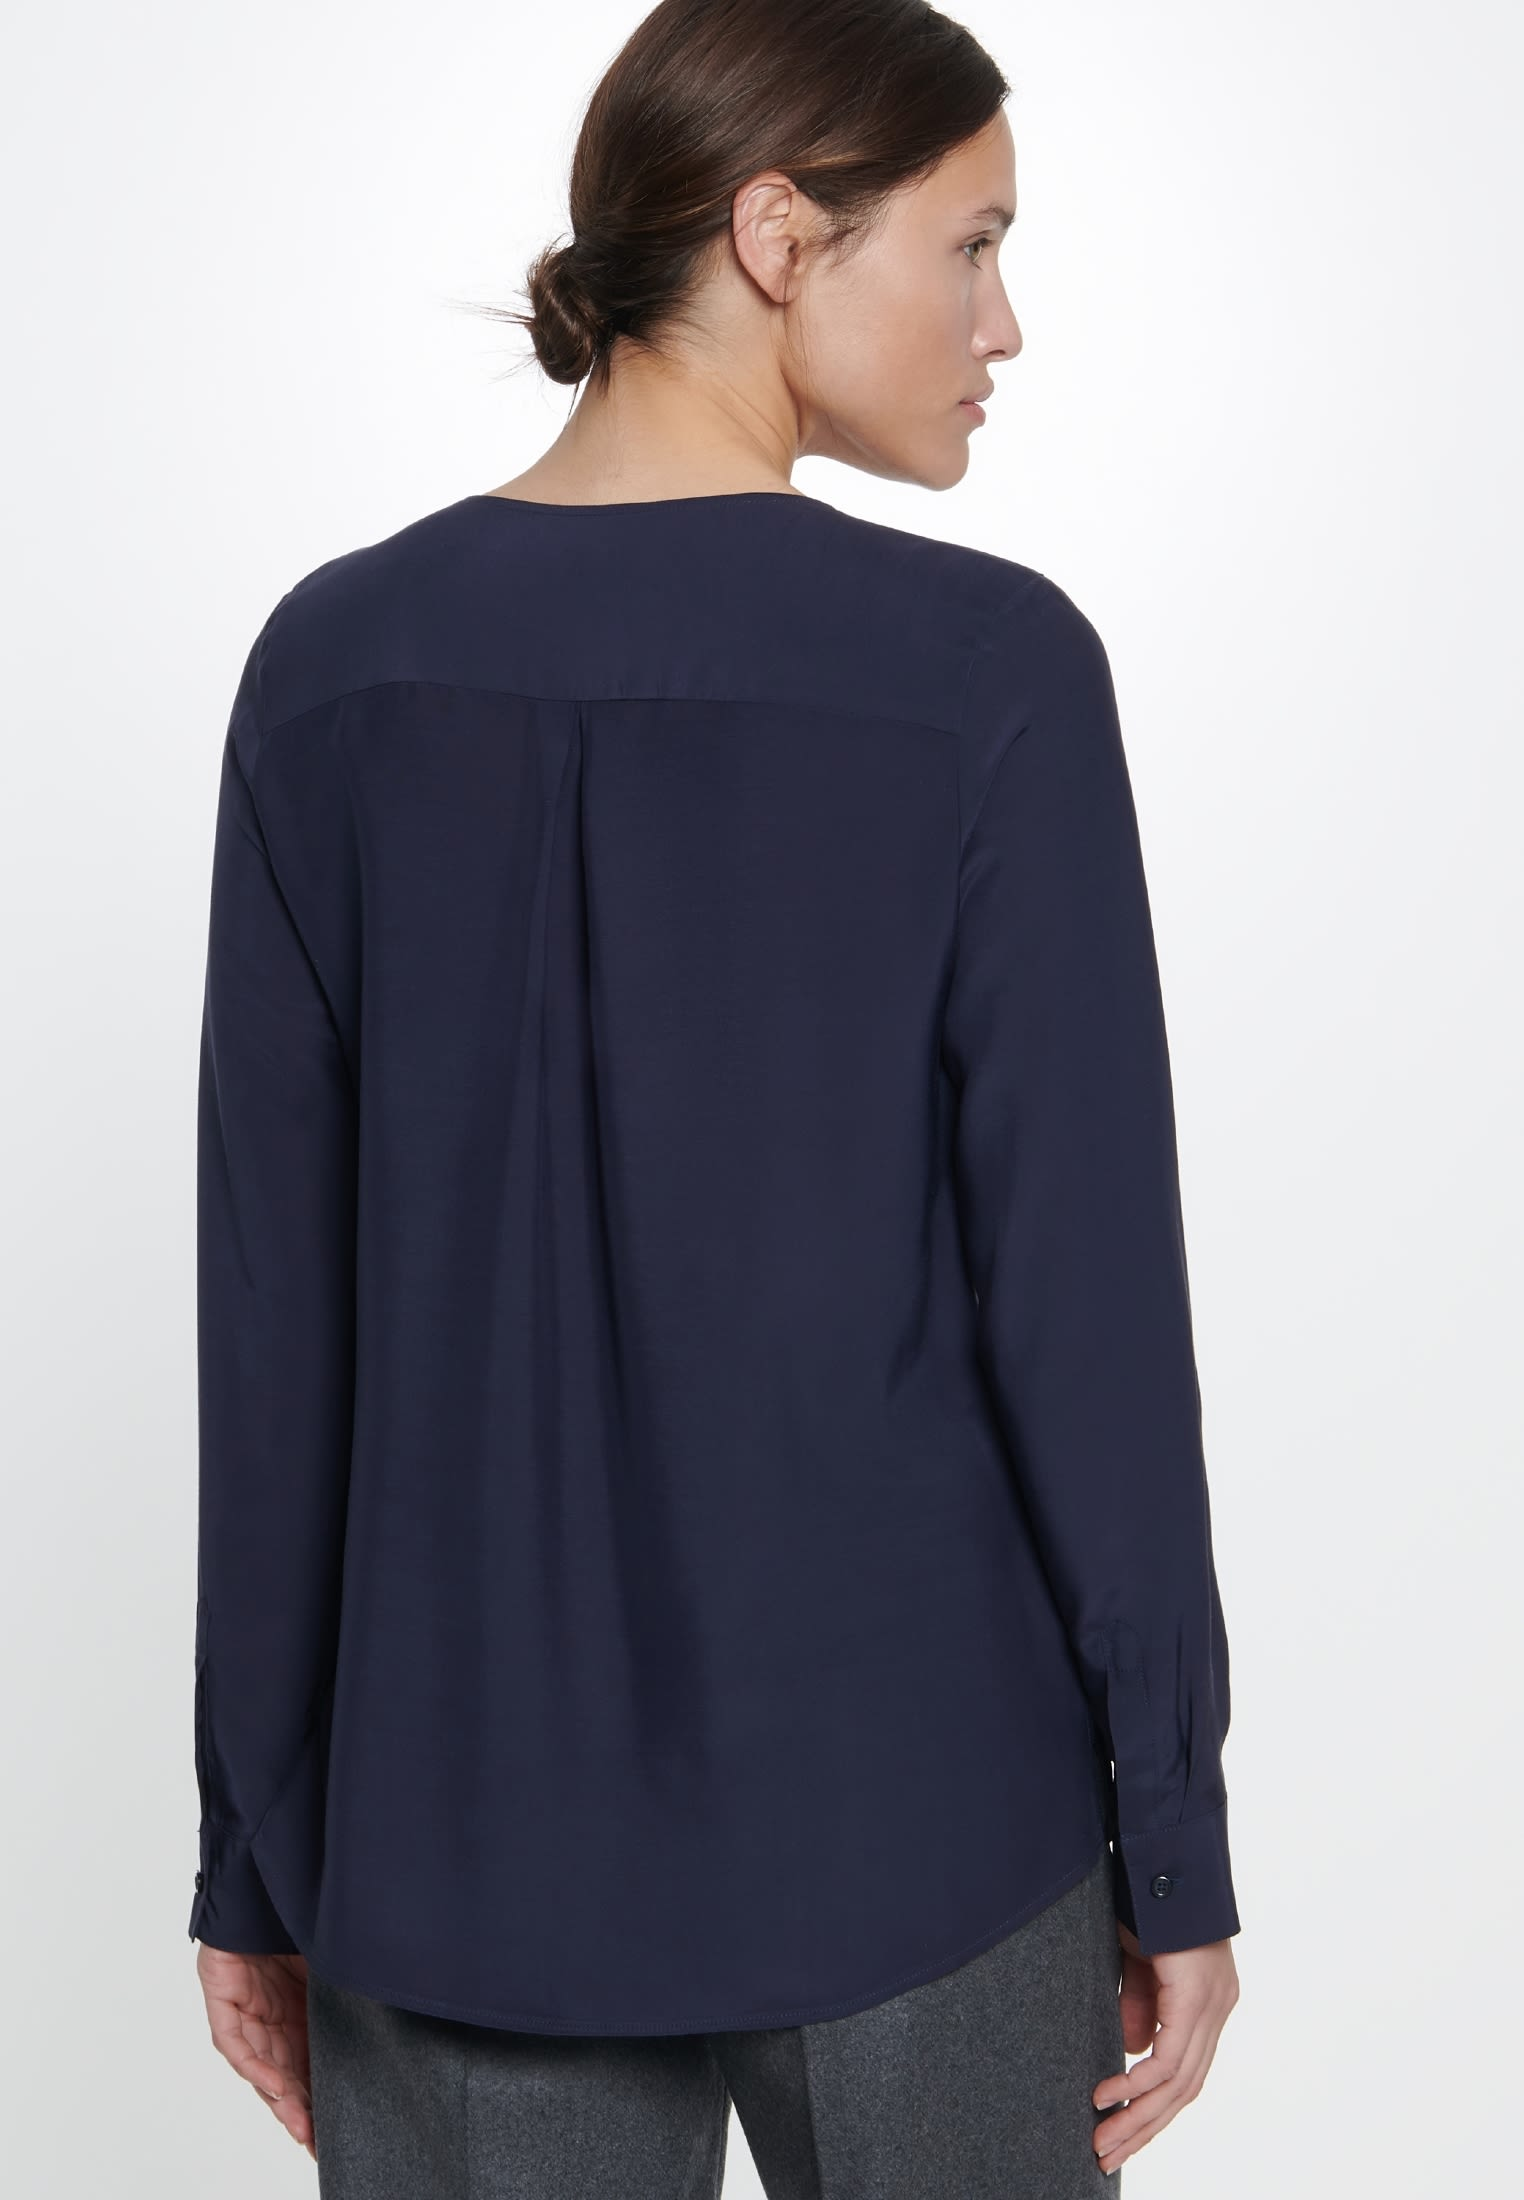 Voile Slip Over Blouse made of 100% Viscose in Dark blue |  Seidensticker Onlineshop